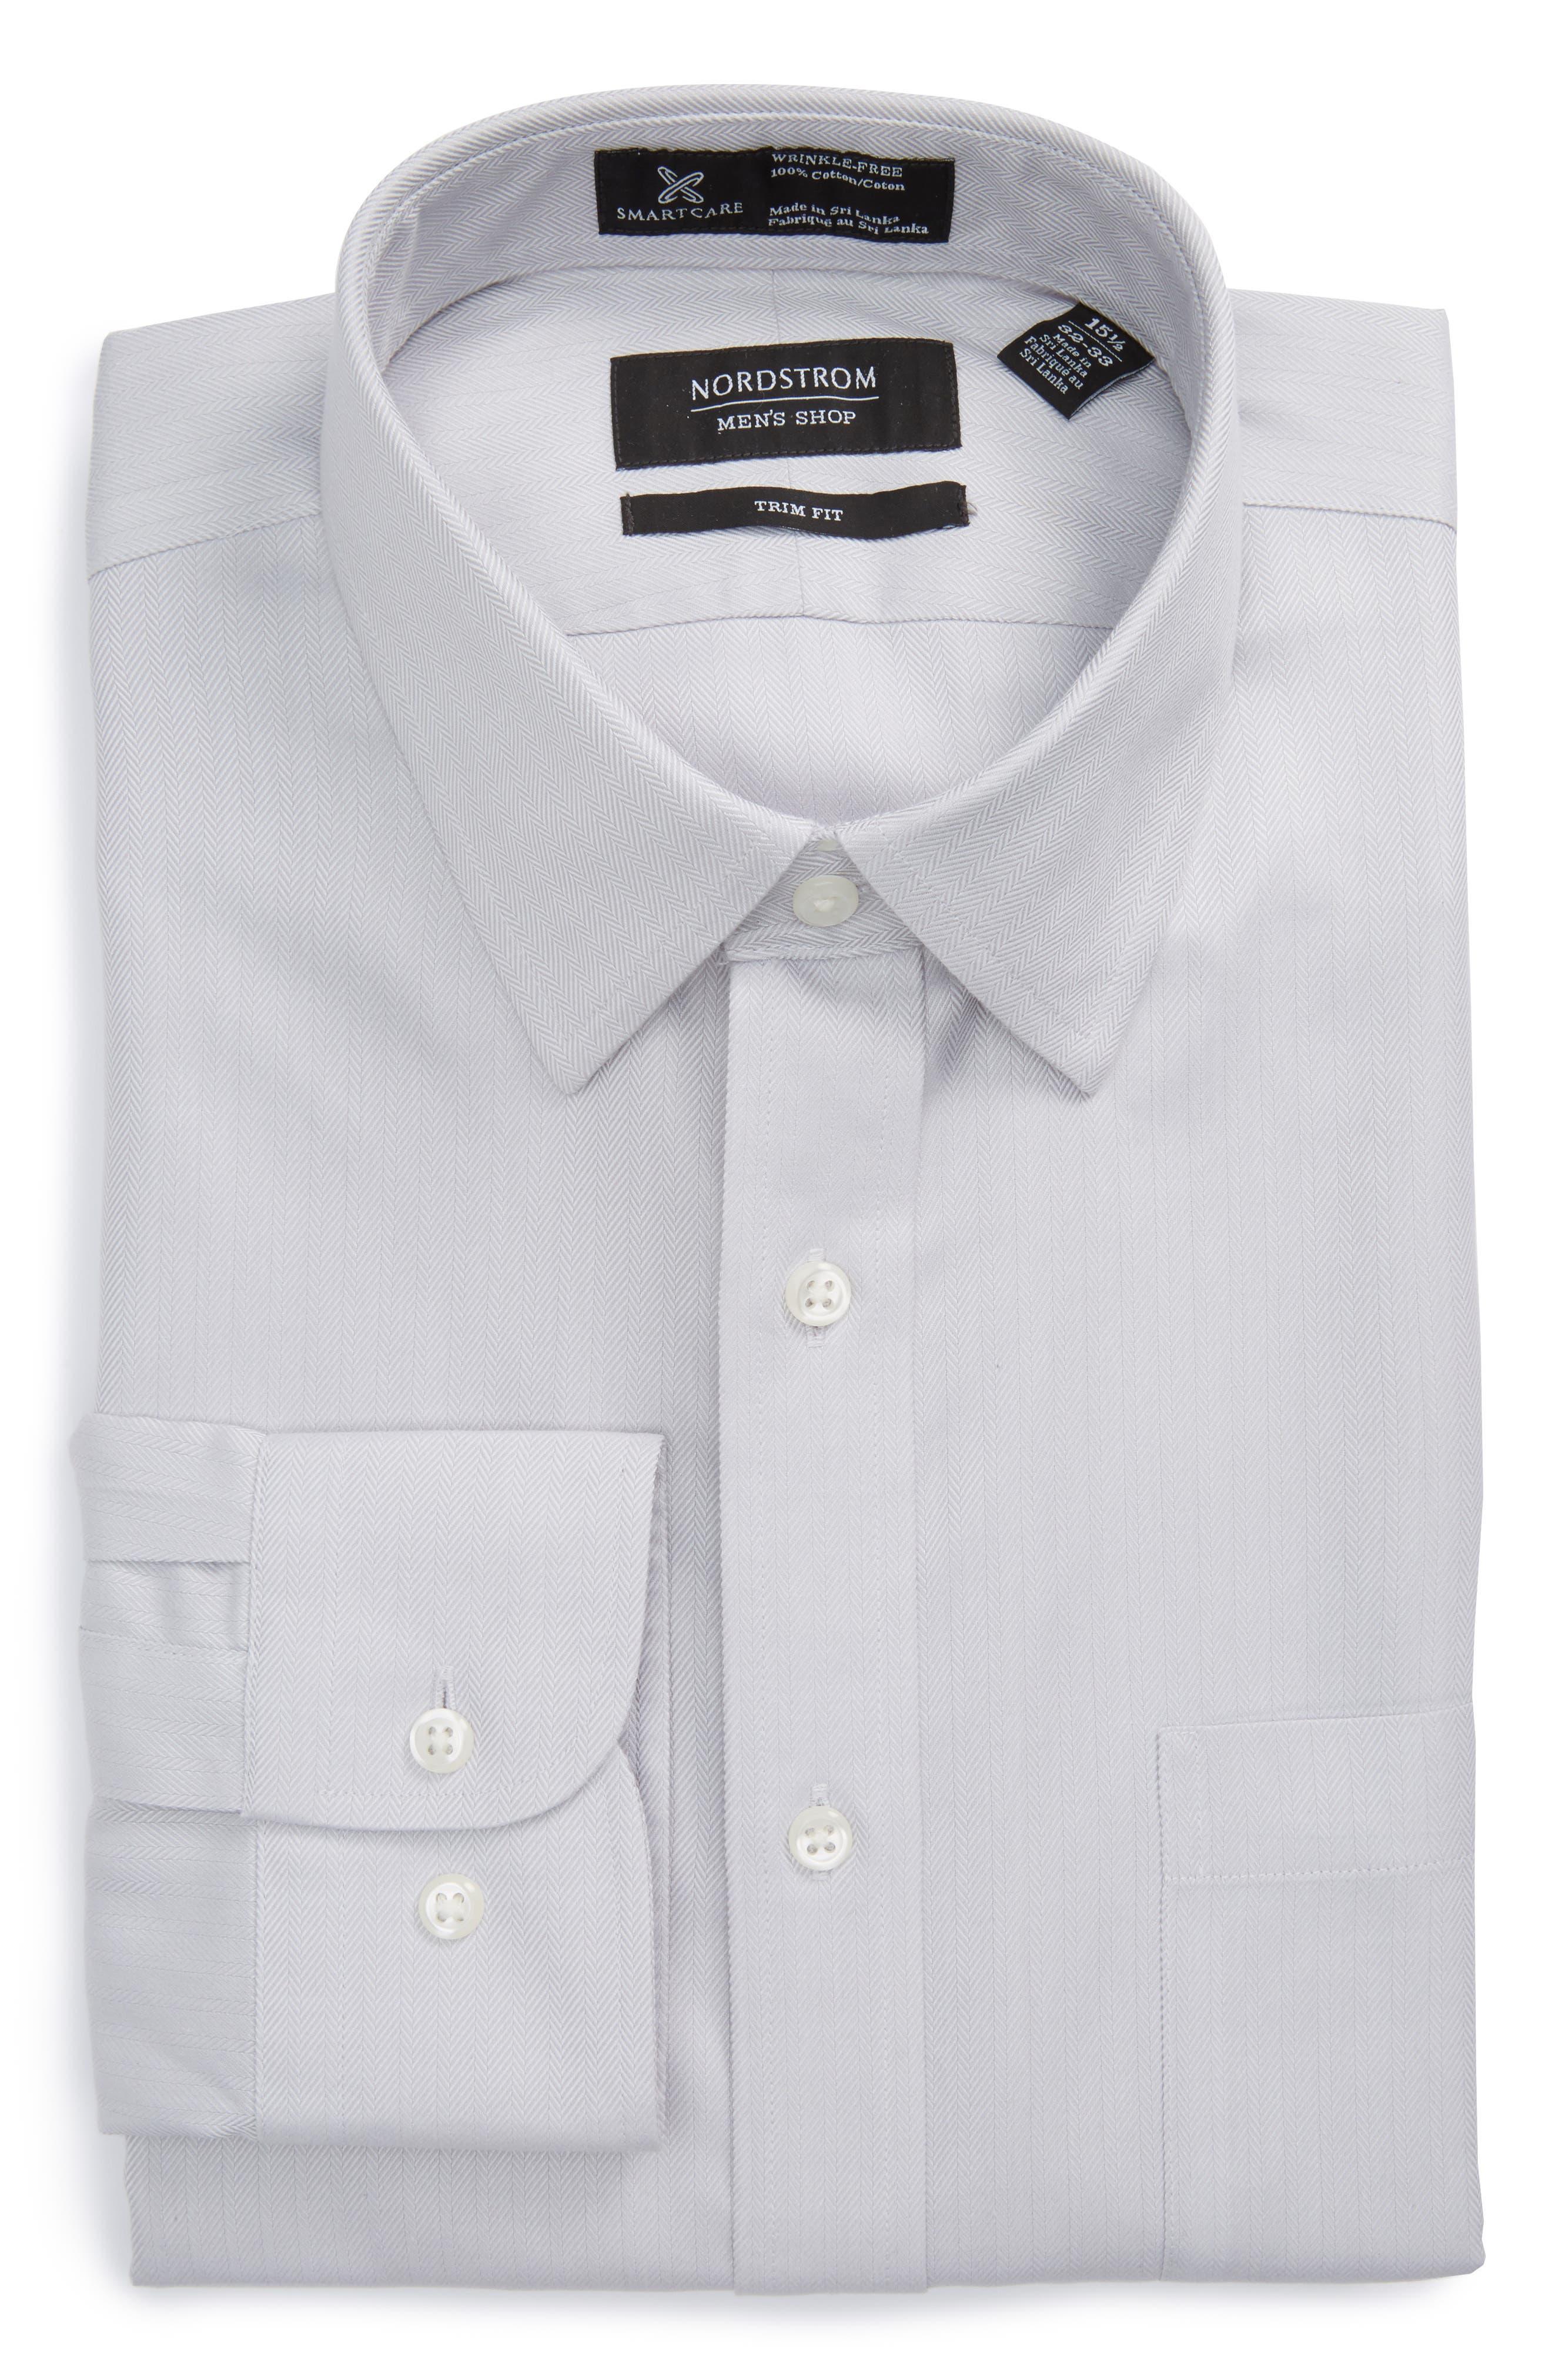 NORDSTROM MEN'S SHOP Smartcare™ Trim Fit Herringbone Dress